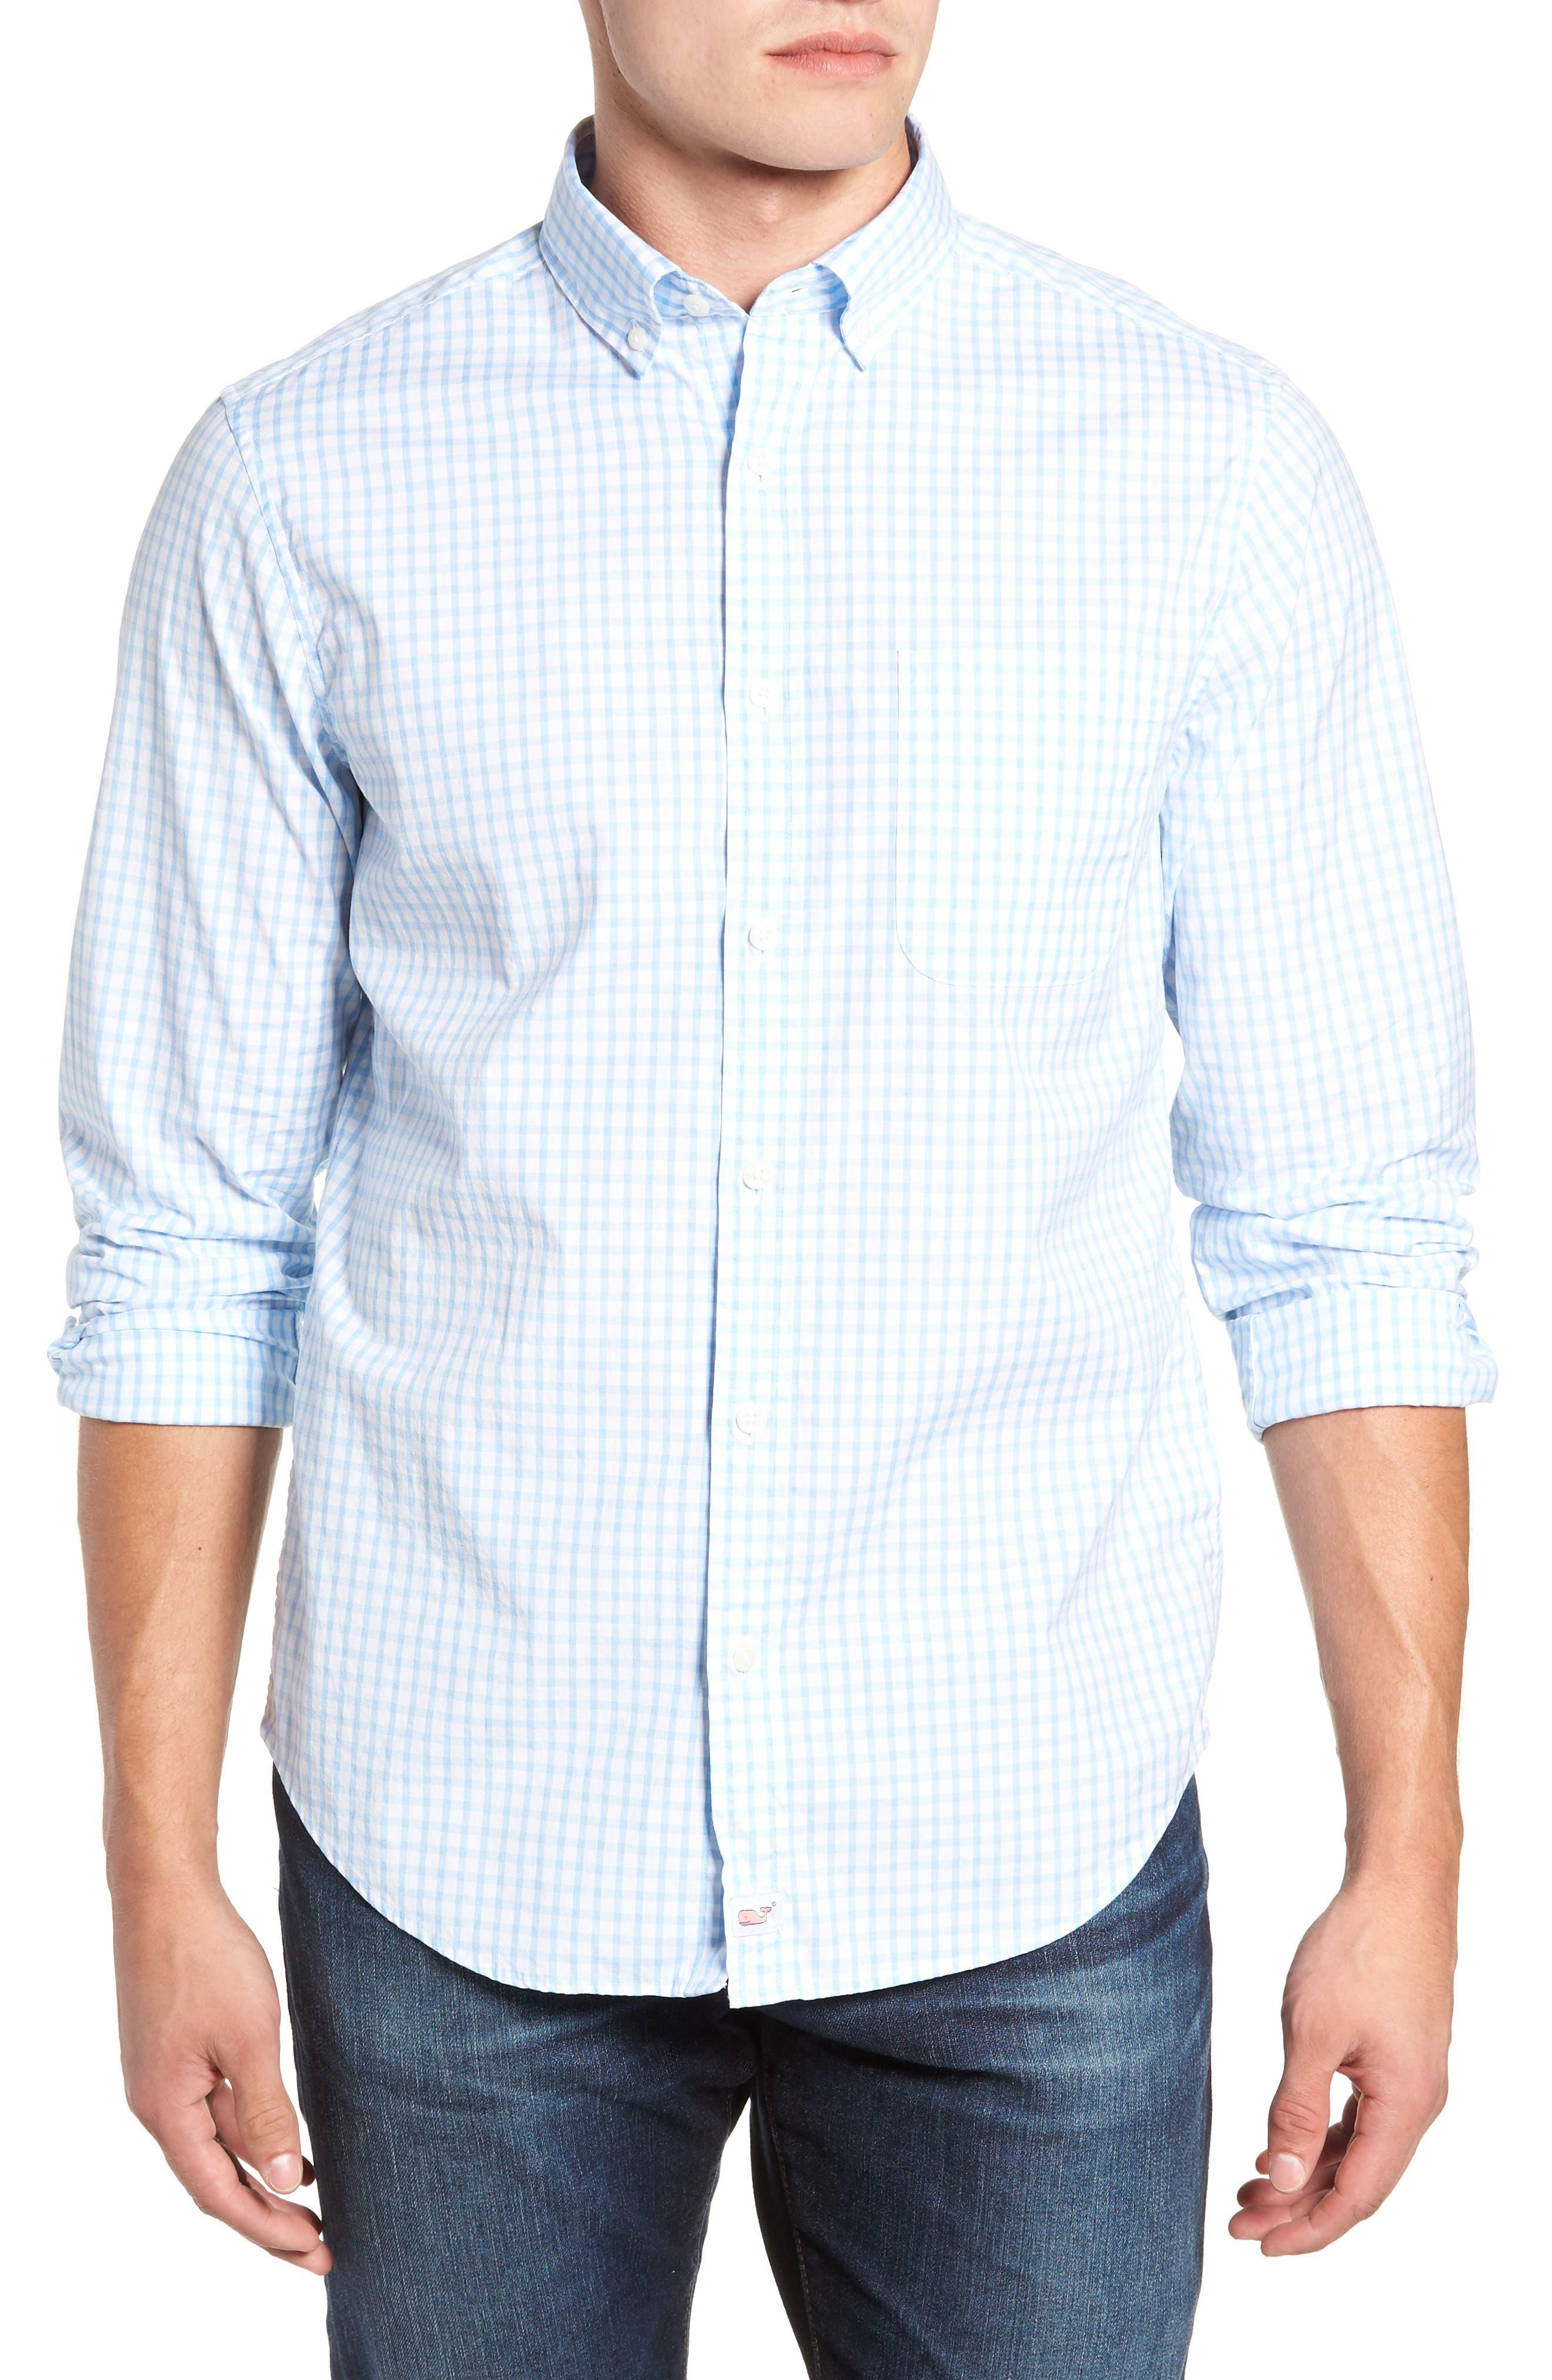 VINEYARD VINES, Micro Graph Classic Fit Check Sport Shirt, Main thumbnail 1, color, OCEAN BREEZE